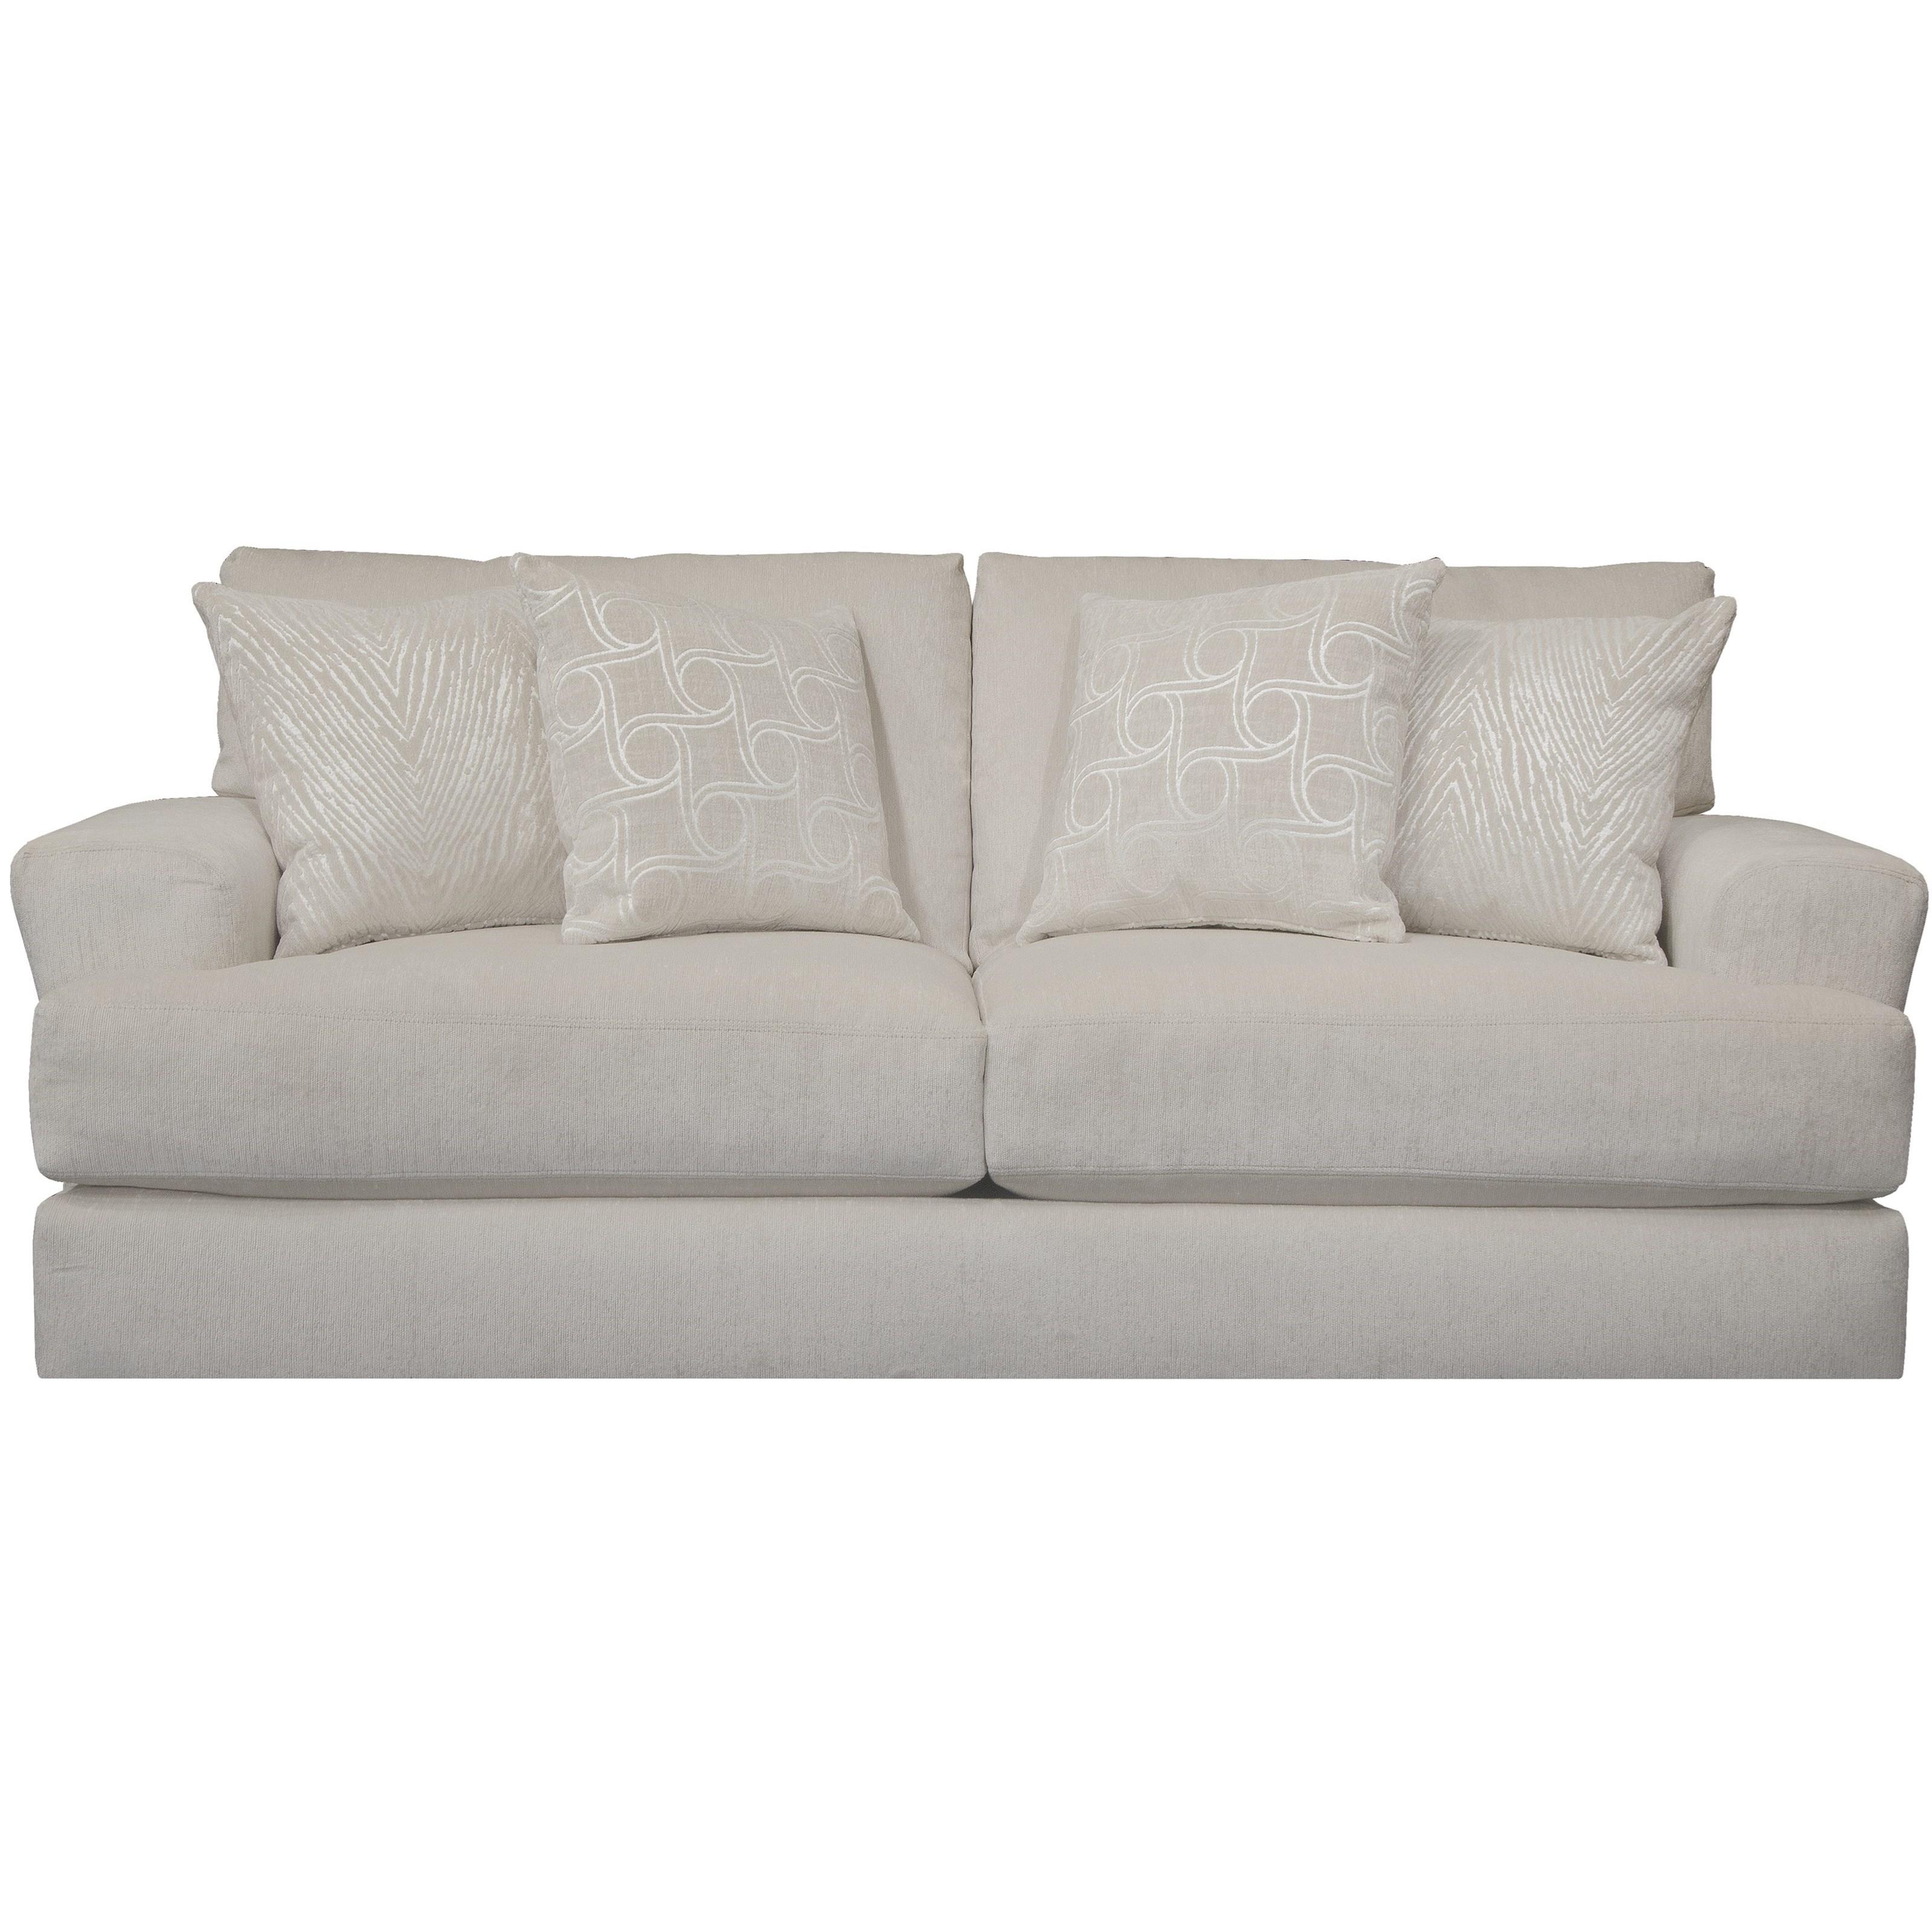 Lamar Sofa by Jackson Furniture at Northeast Factory Direct